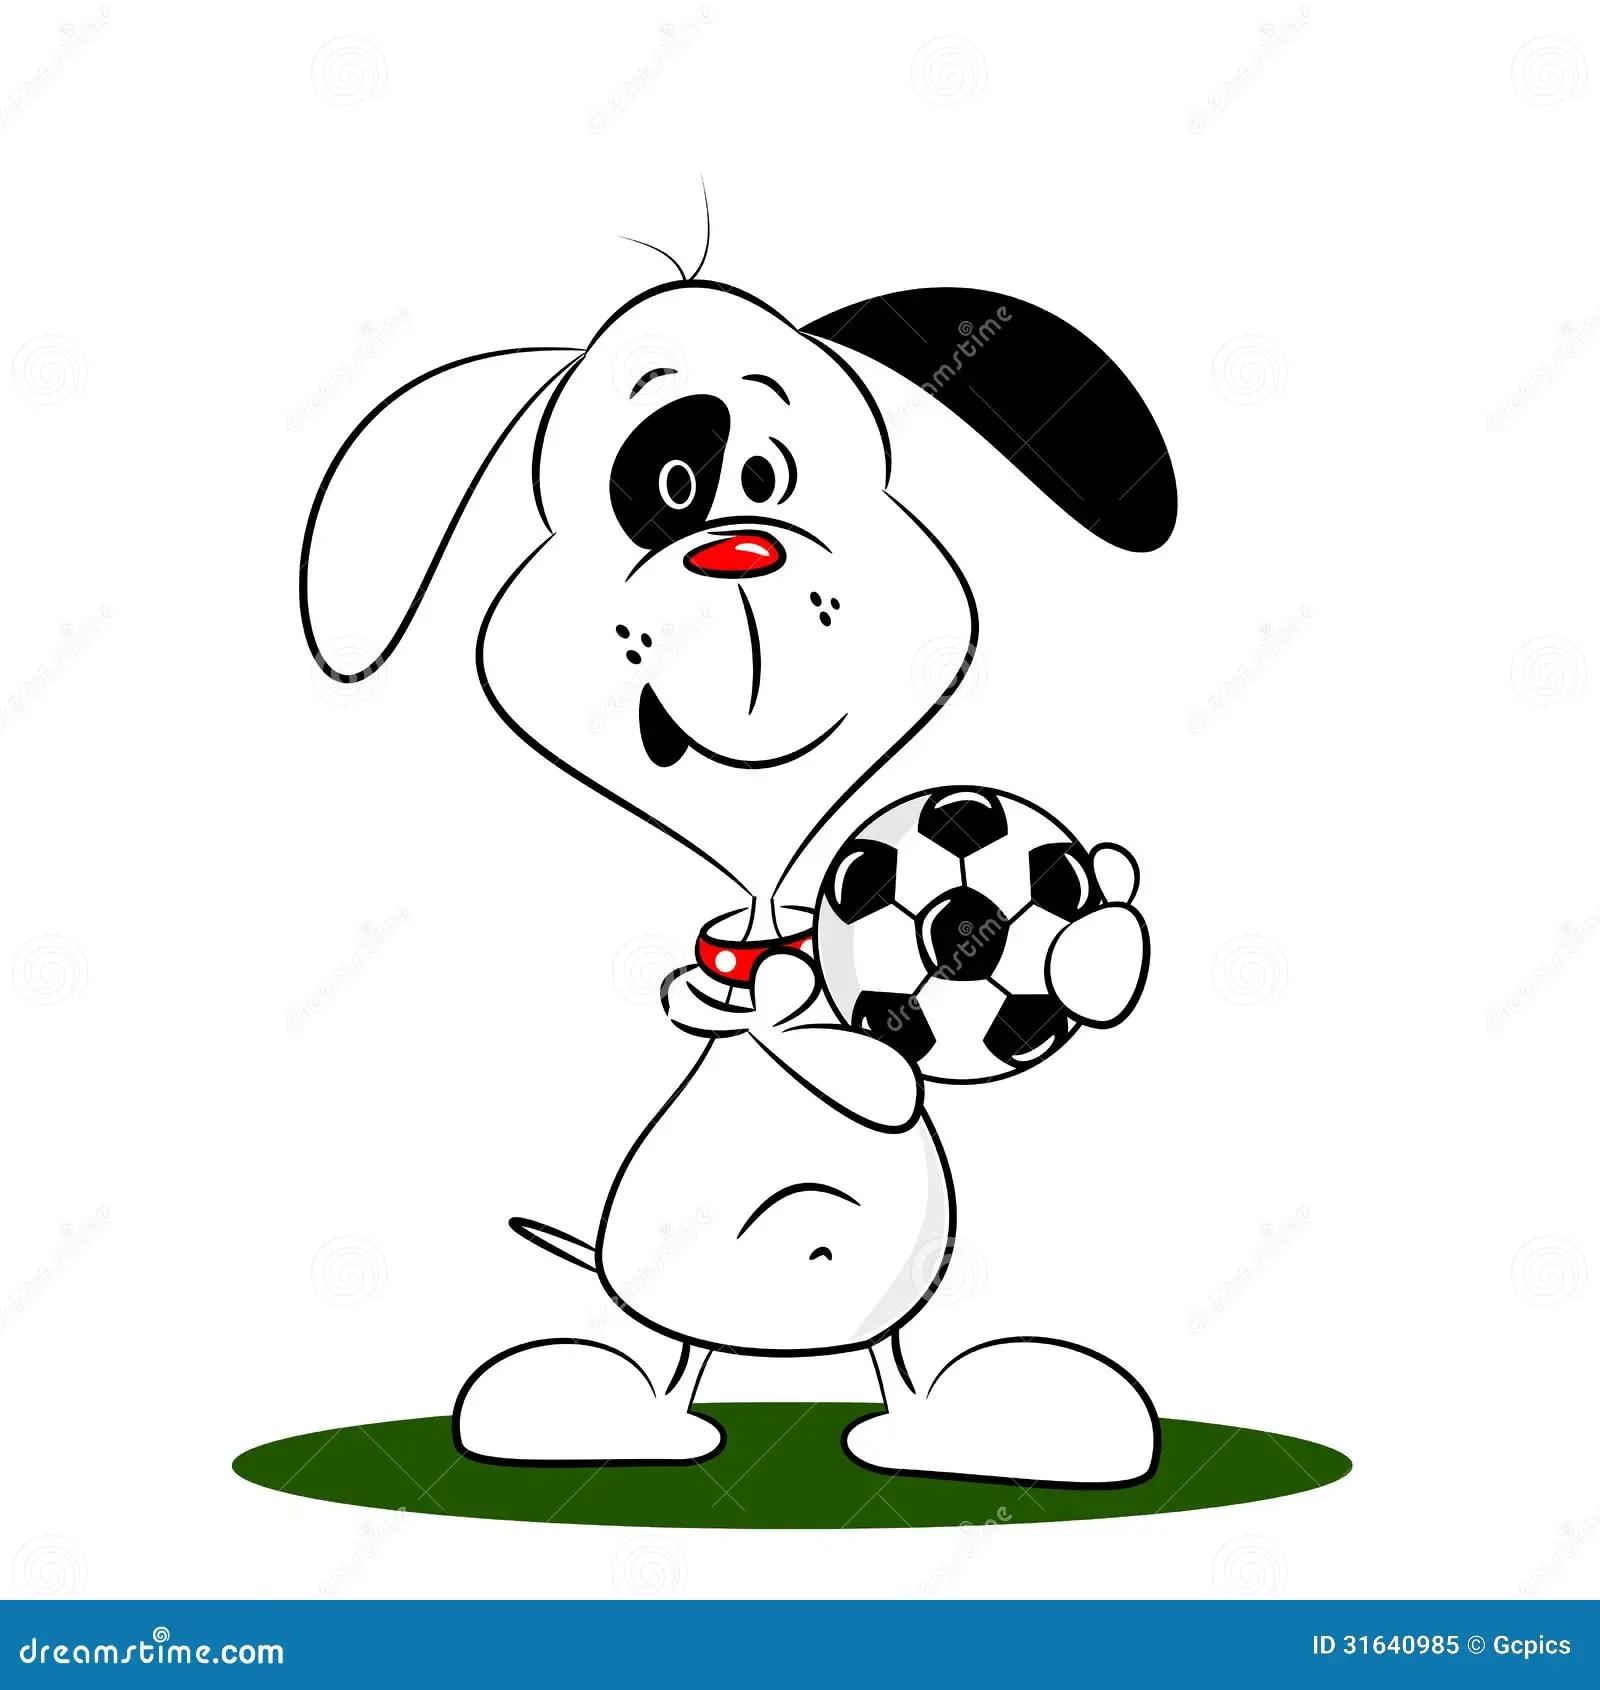 A Cartoon Dog Holding A Football Royalty Free Stock Photo